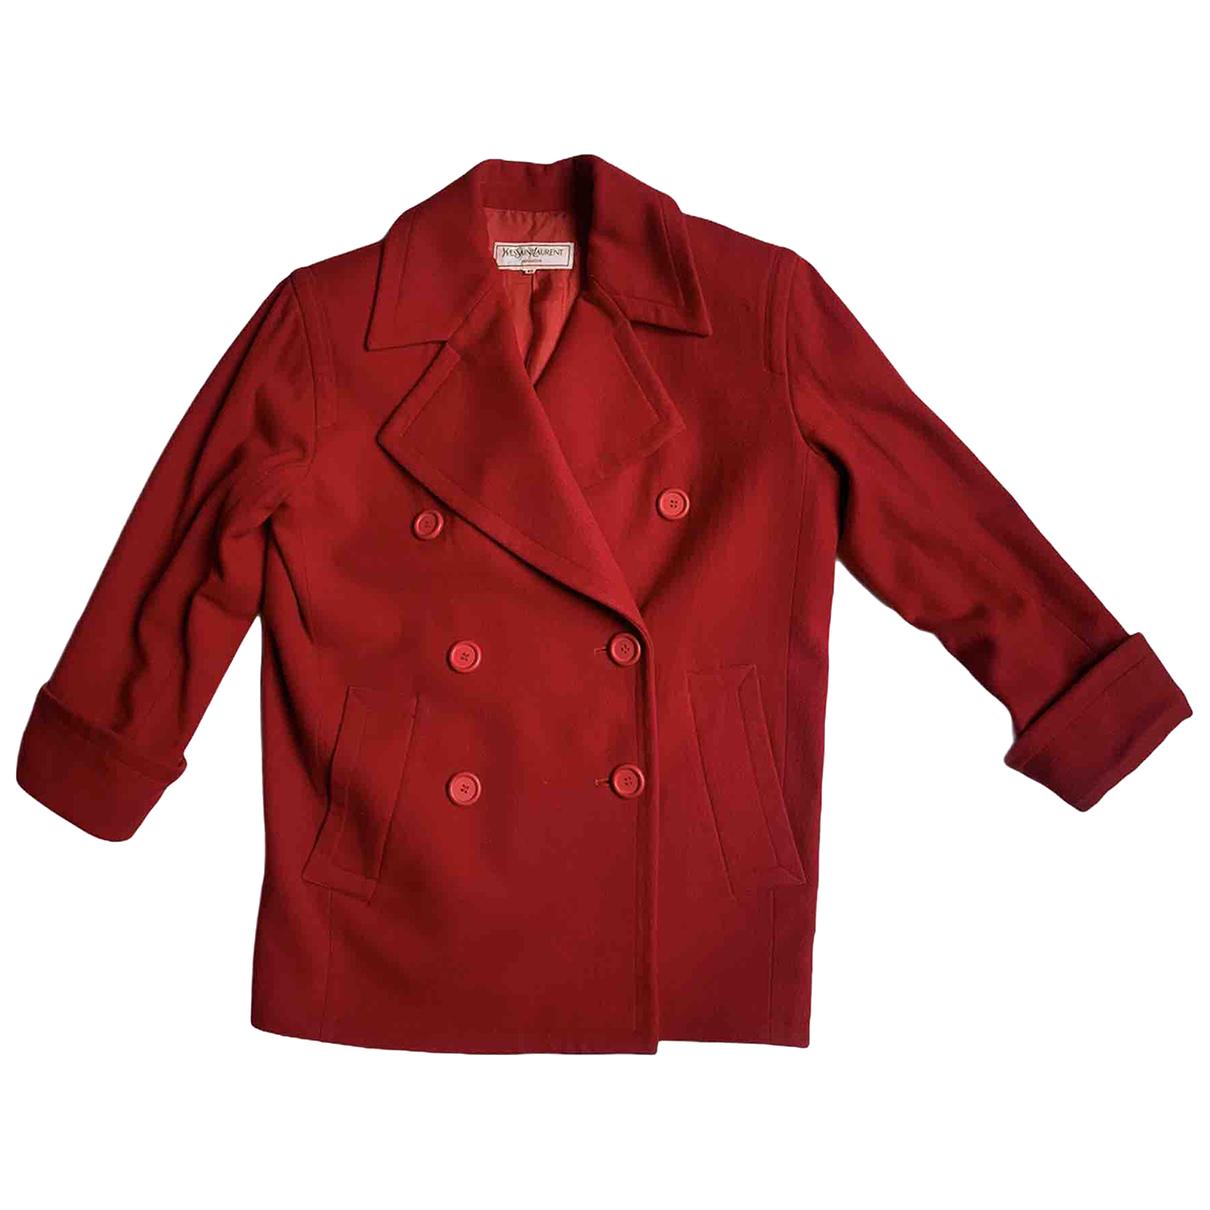 Yves Saint Laurent N Red Wool jacket for Women 40 FR